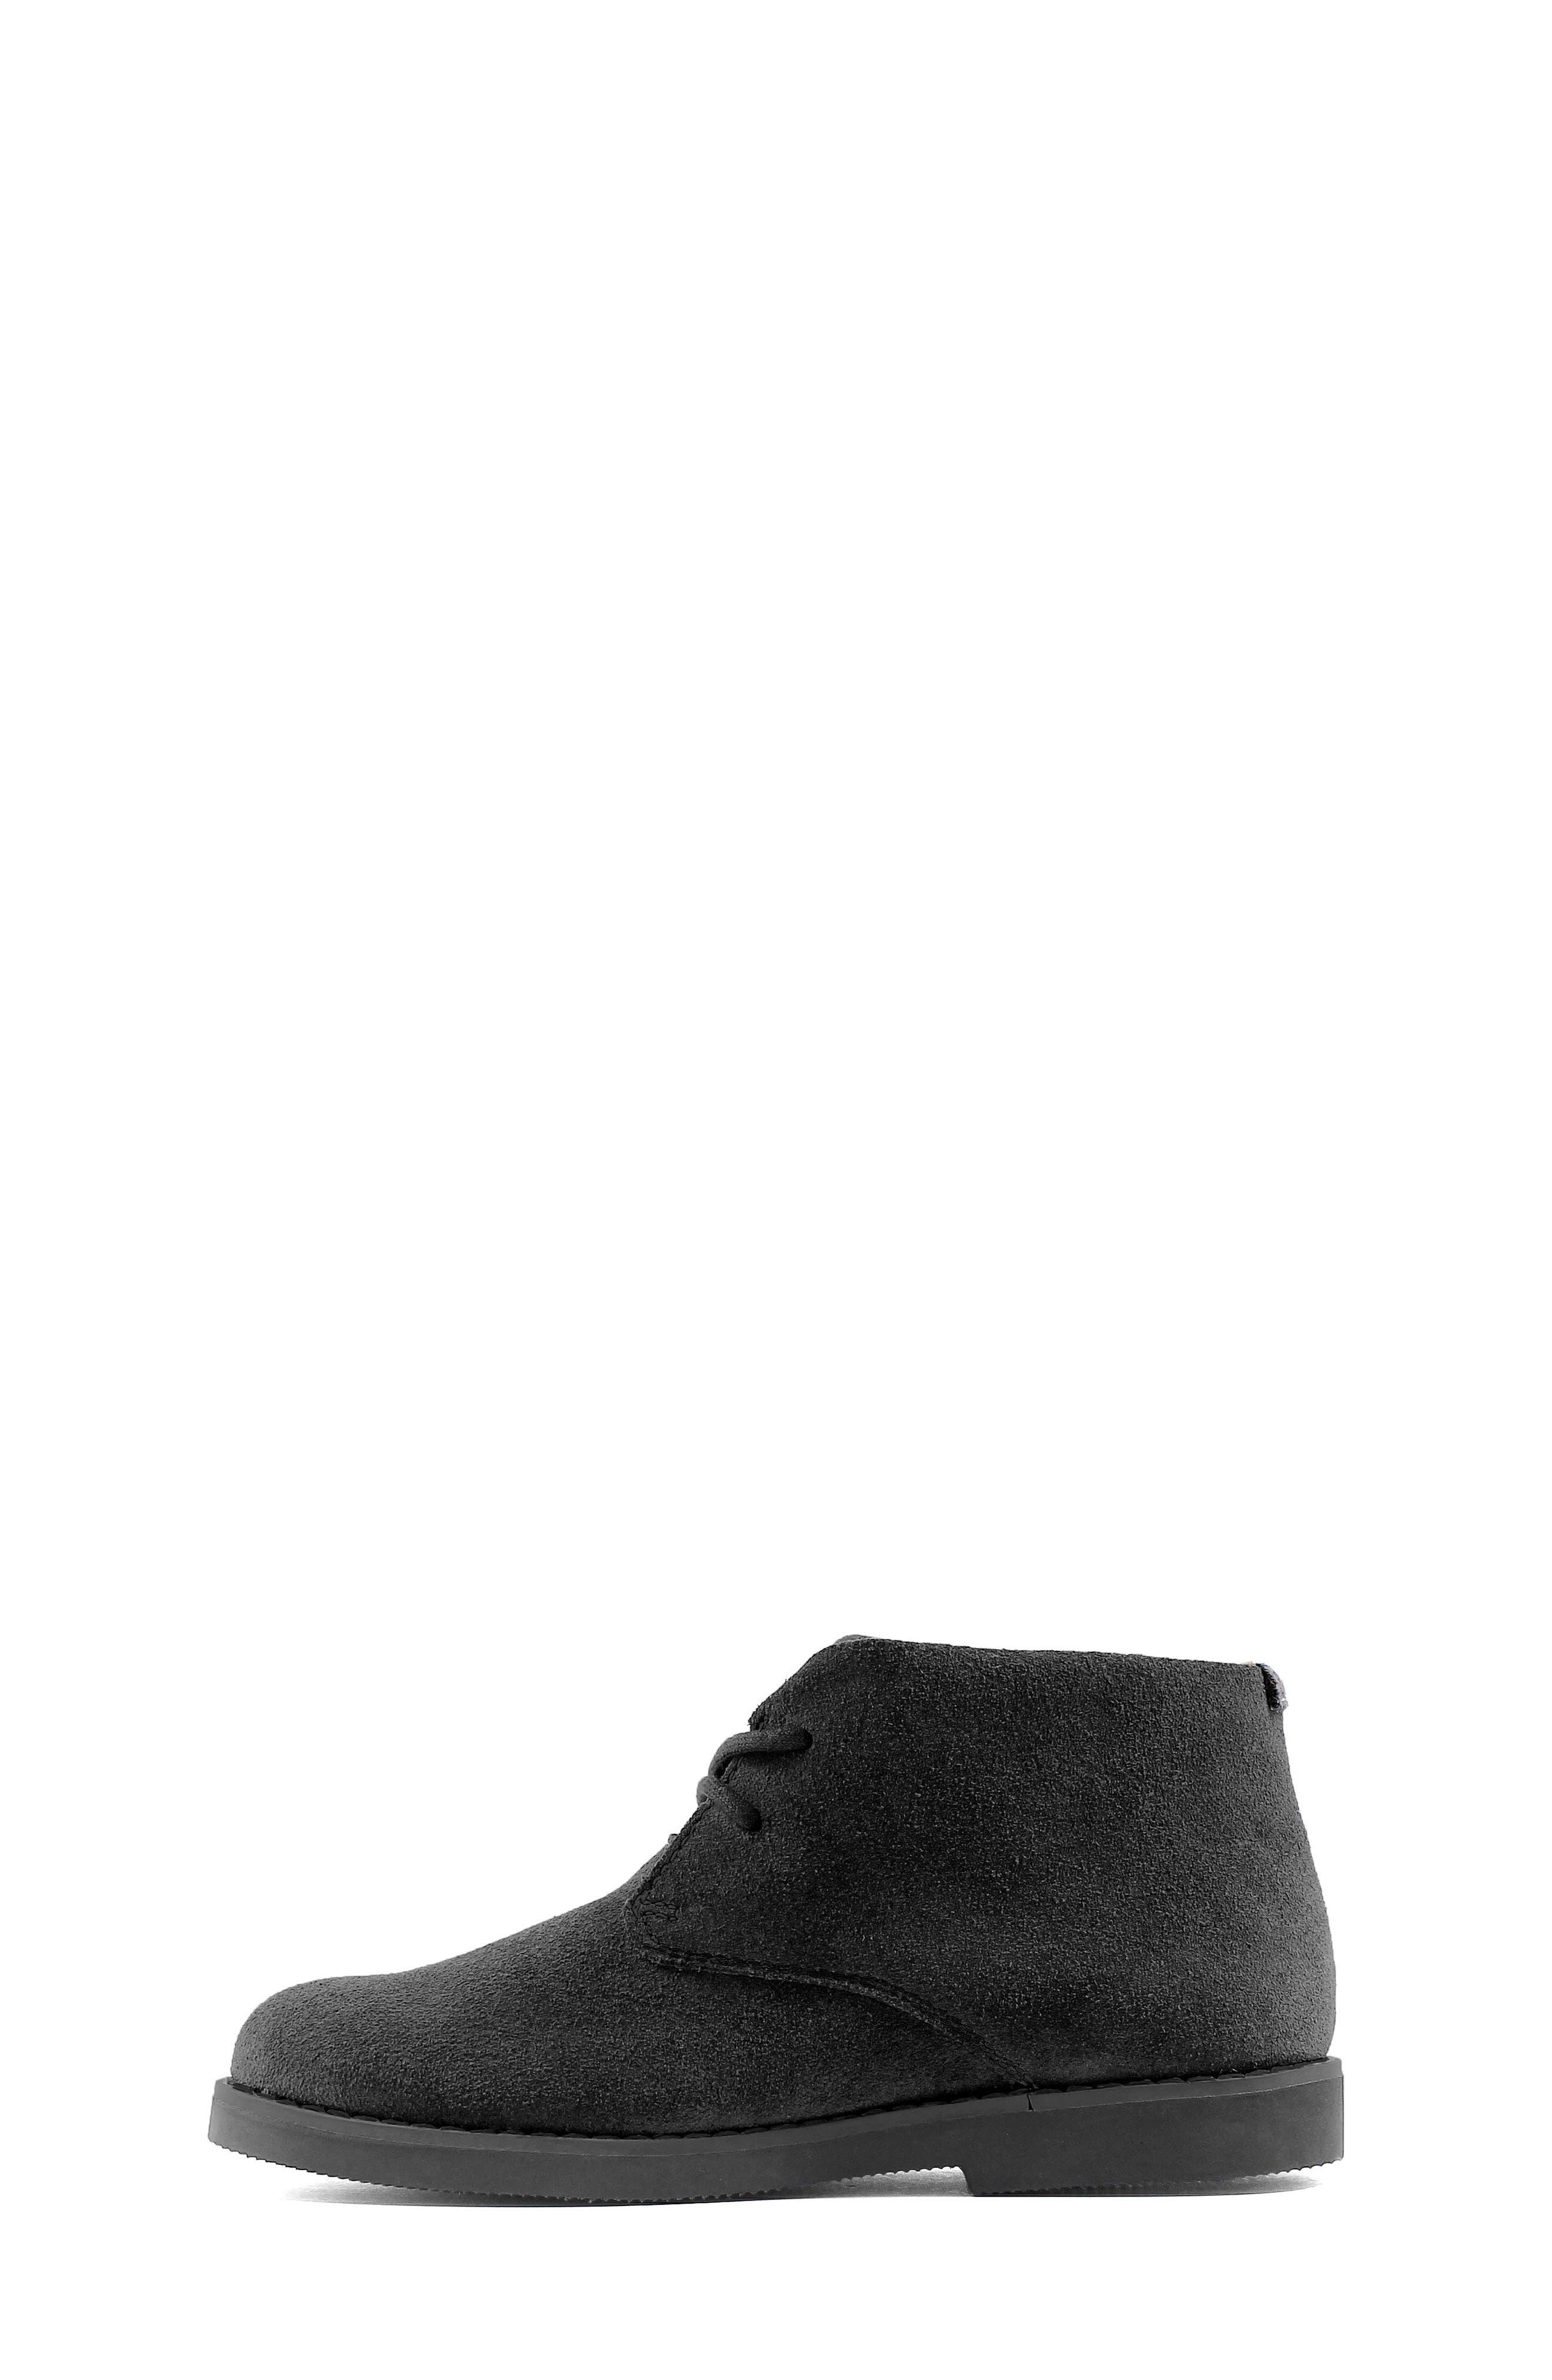 'Quinlan' Chukka Boot,                             Alternate thumbnail 7, color,                             001